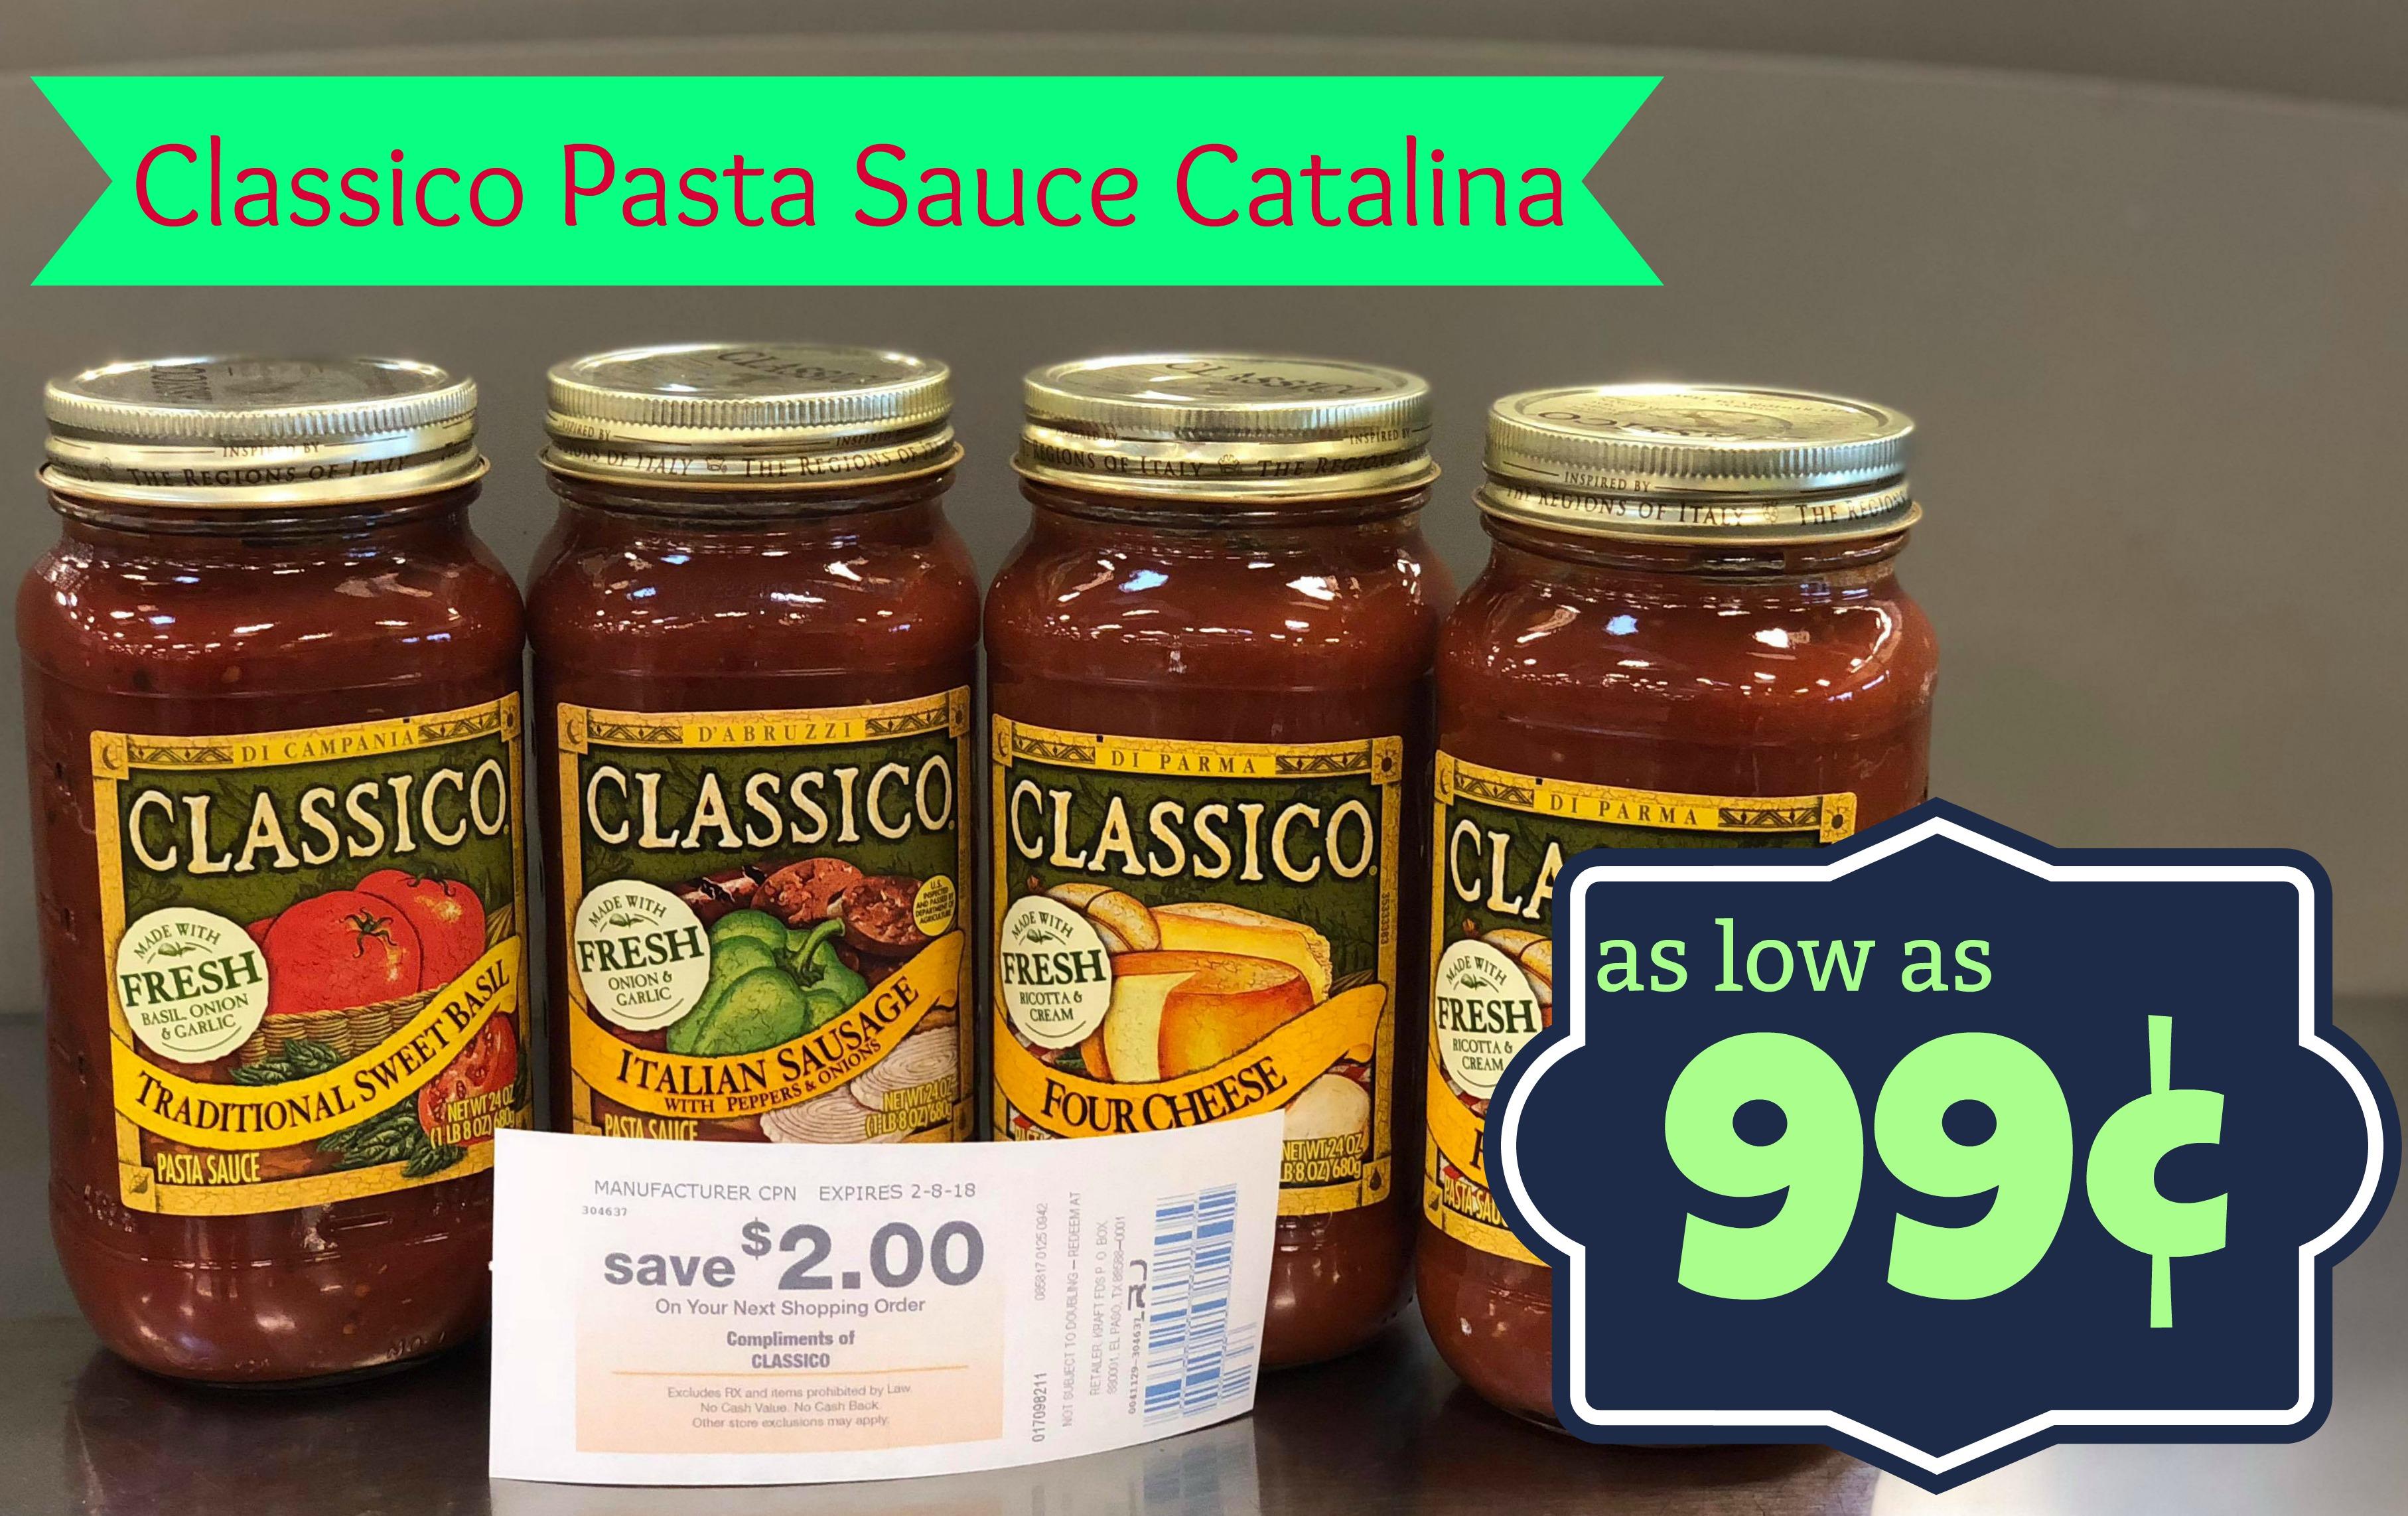 Classico pasta sauce coupons 2018